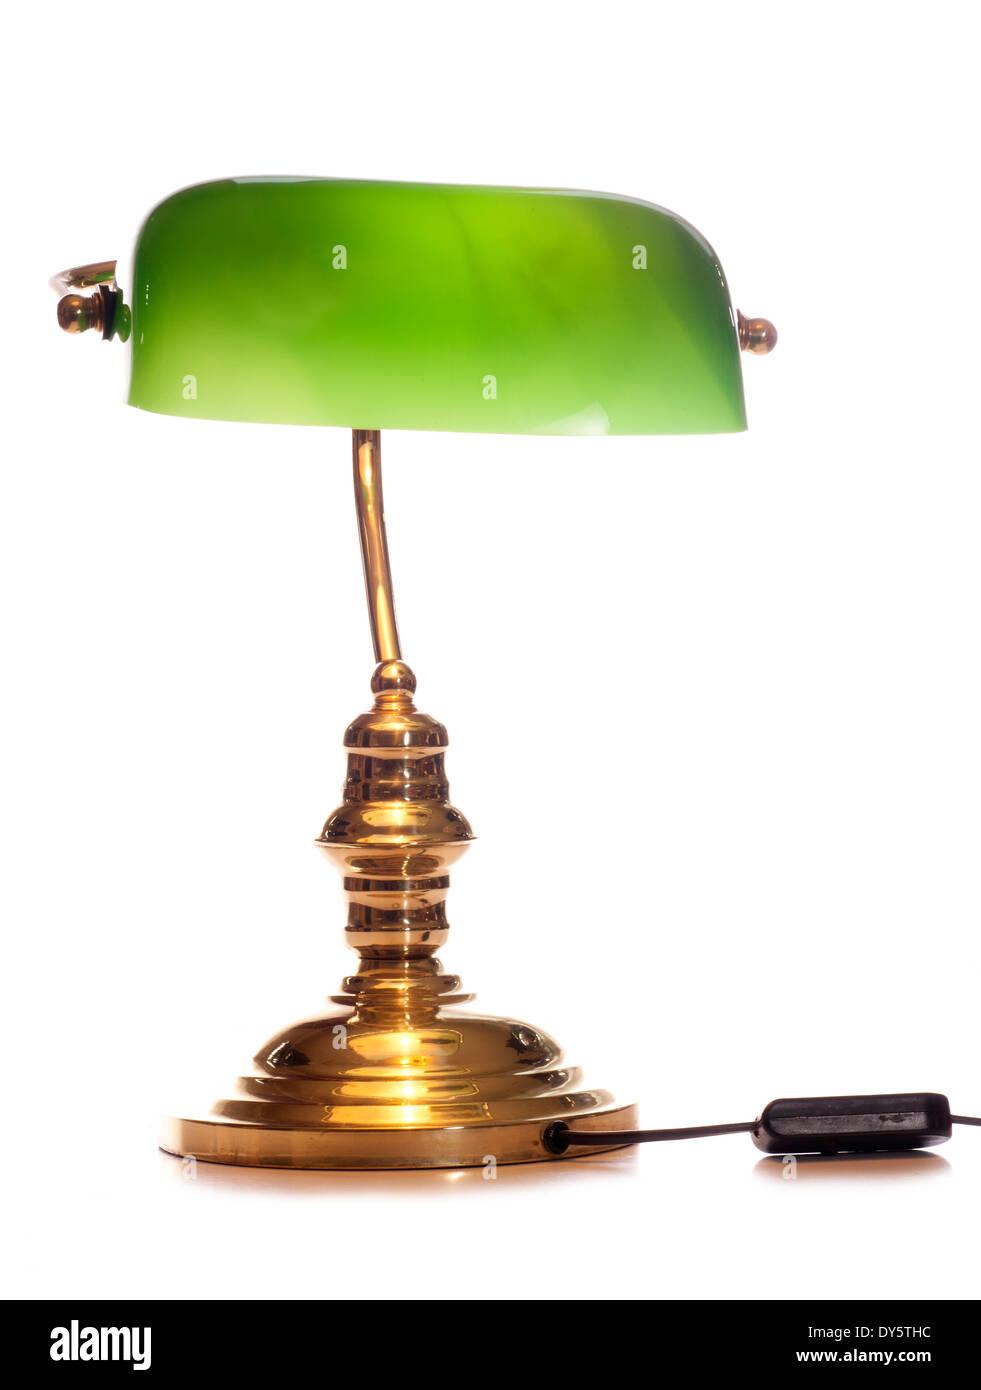 antique green bankers lamp studio cutout - Stock Image